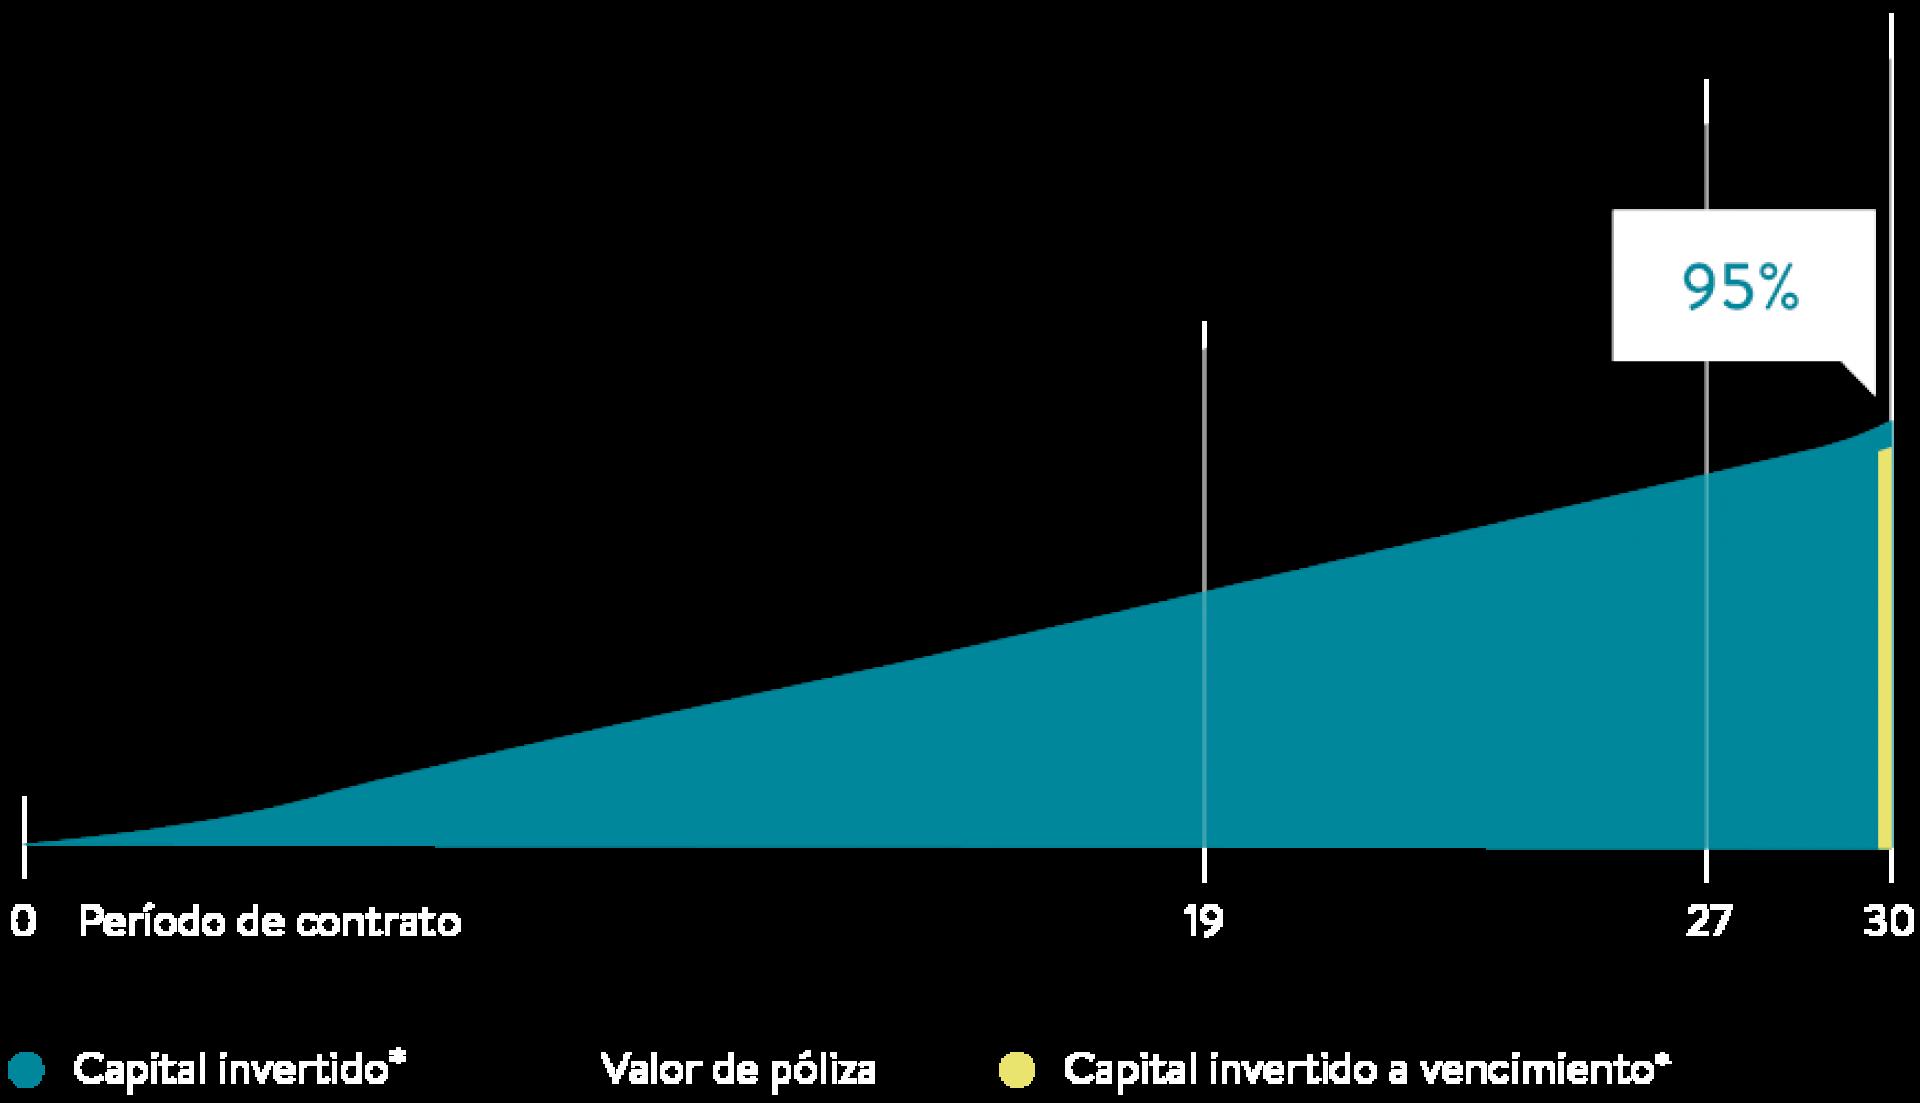 Spanish Conservador 95